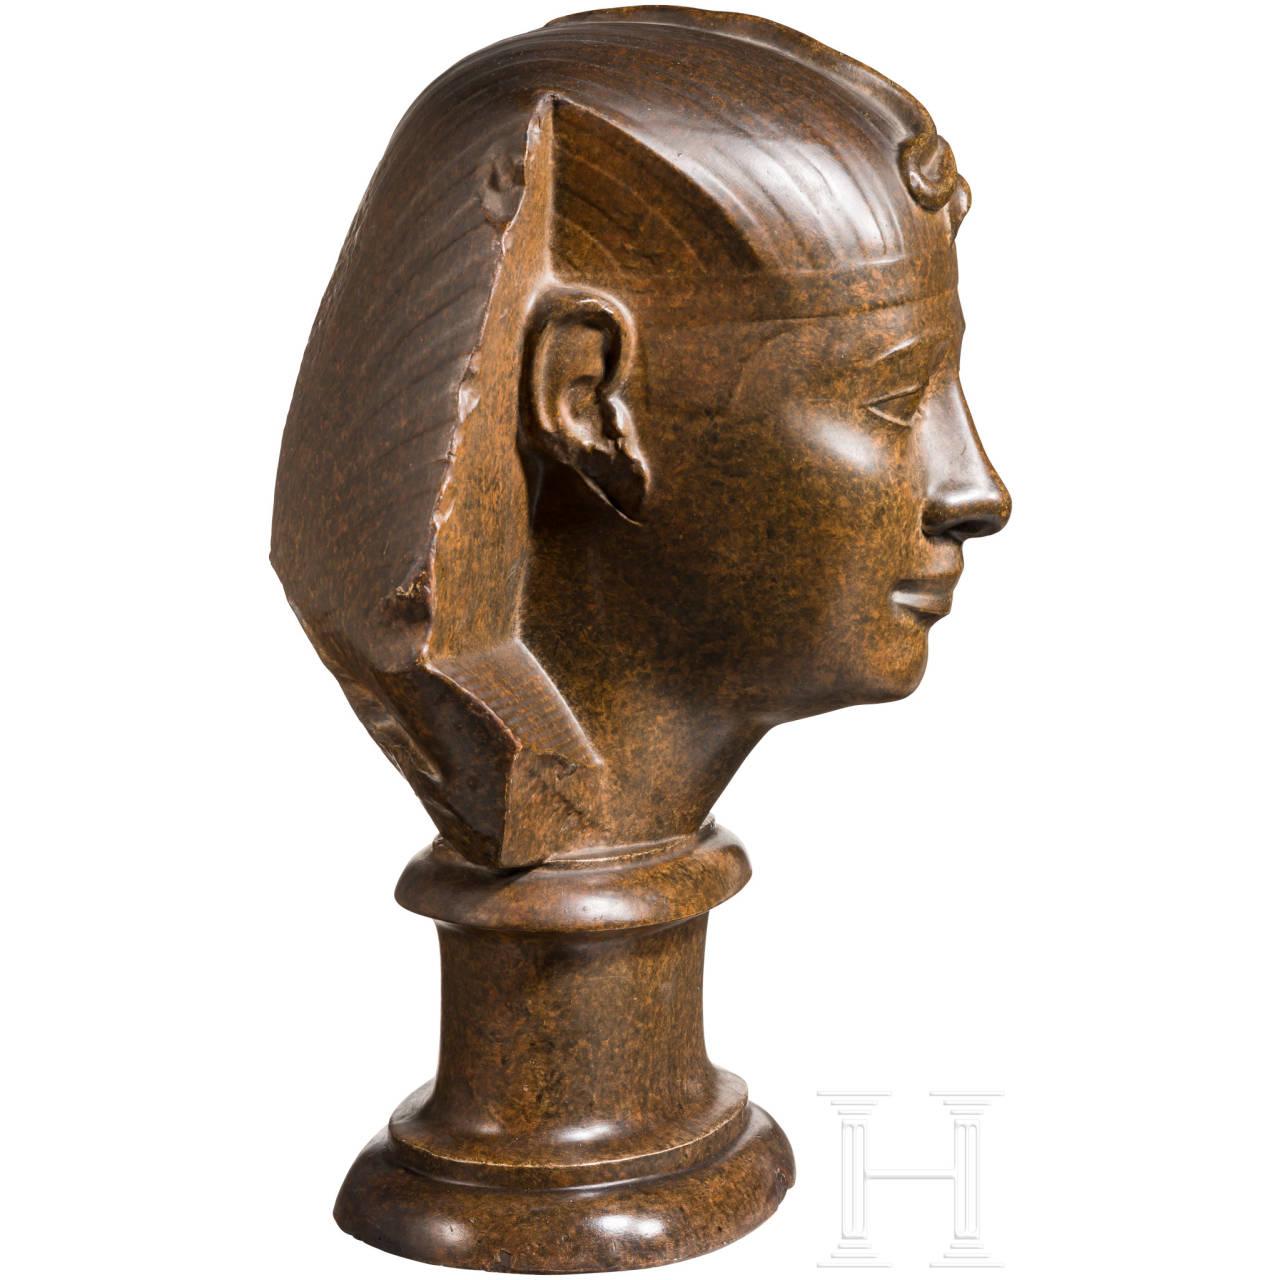 Abguss eines monumentalen Pharaonenkopfes